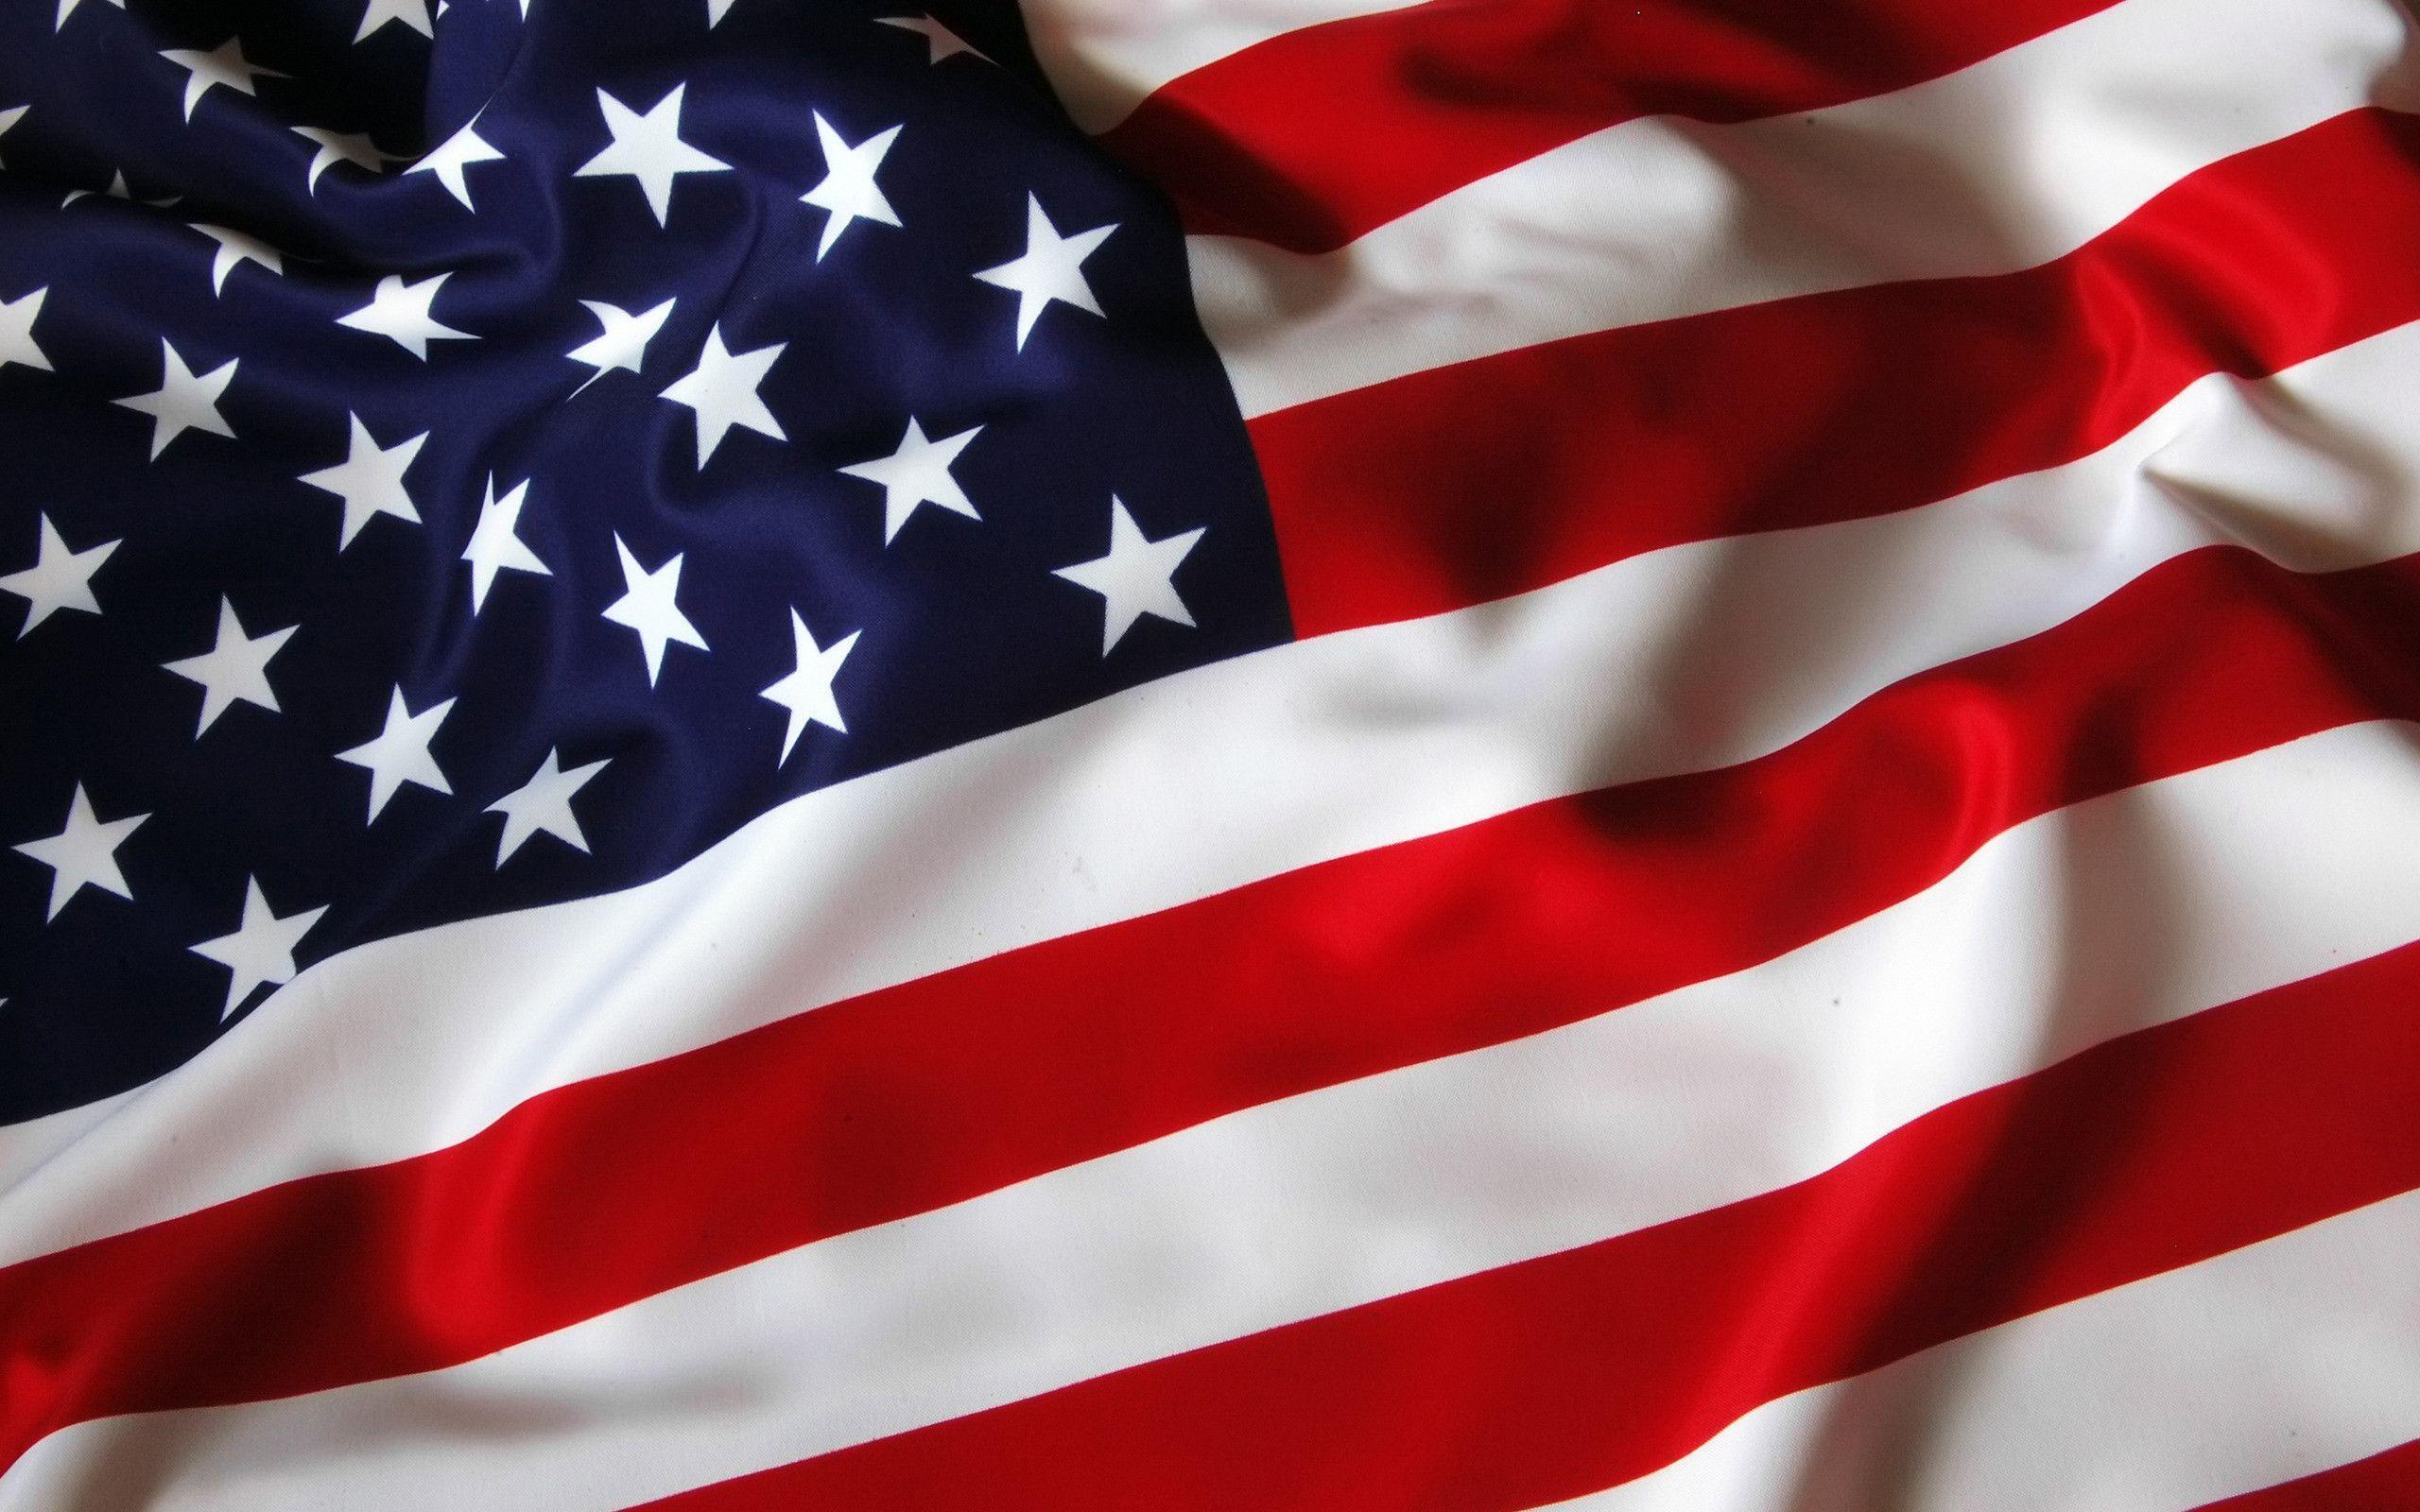 American Flag Desktop Backgrounds 2560x1600